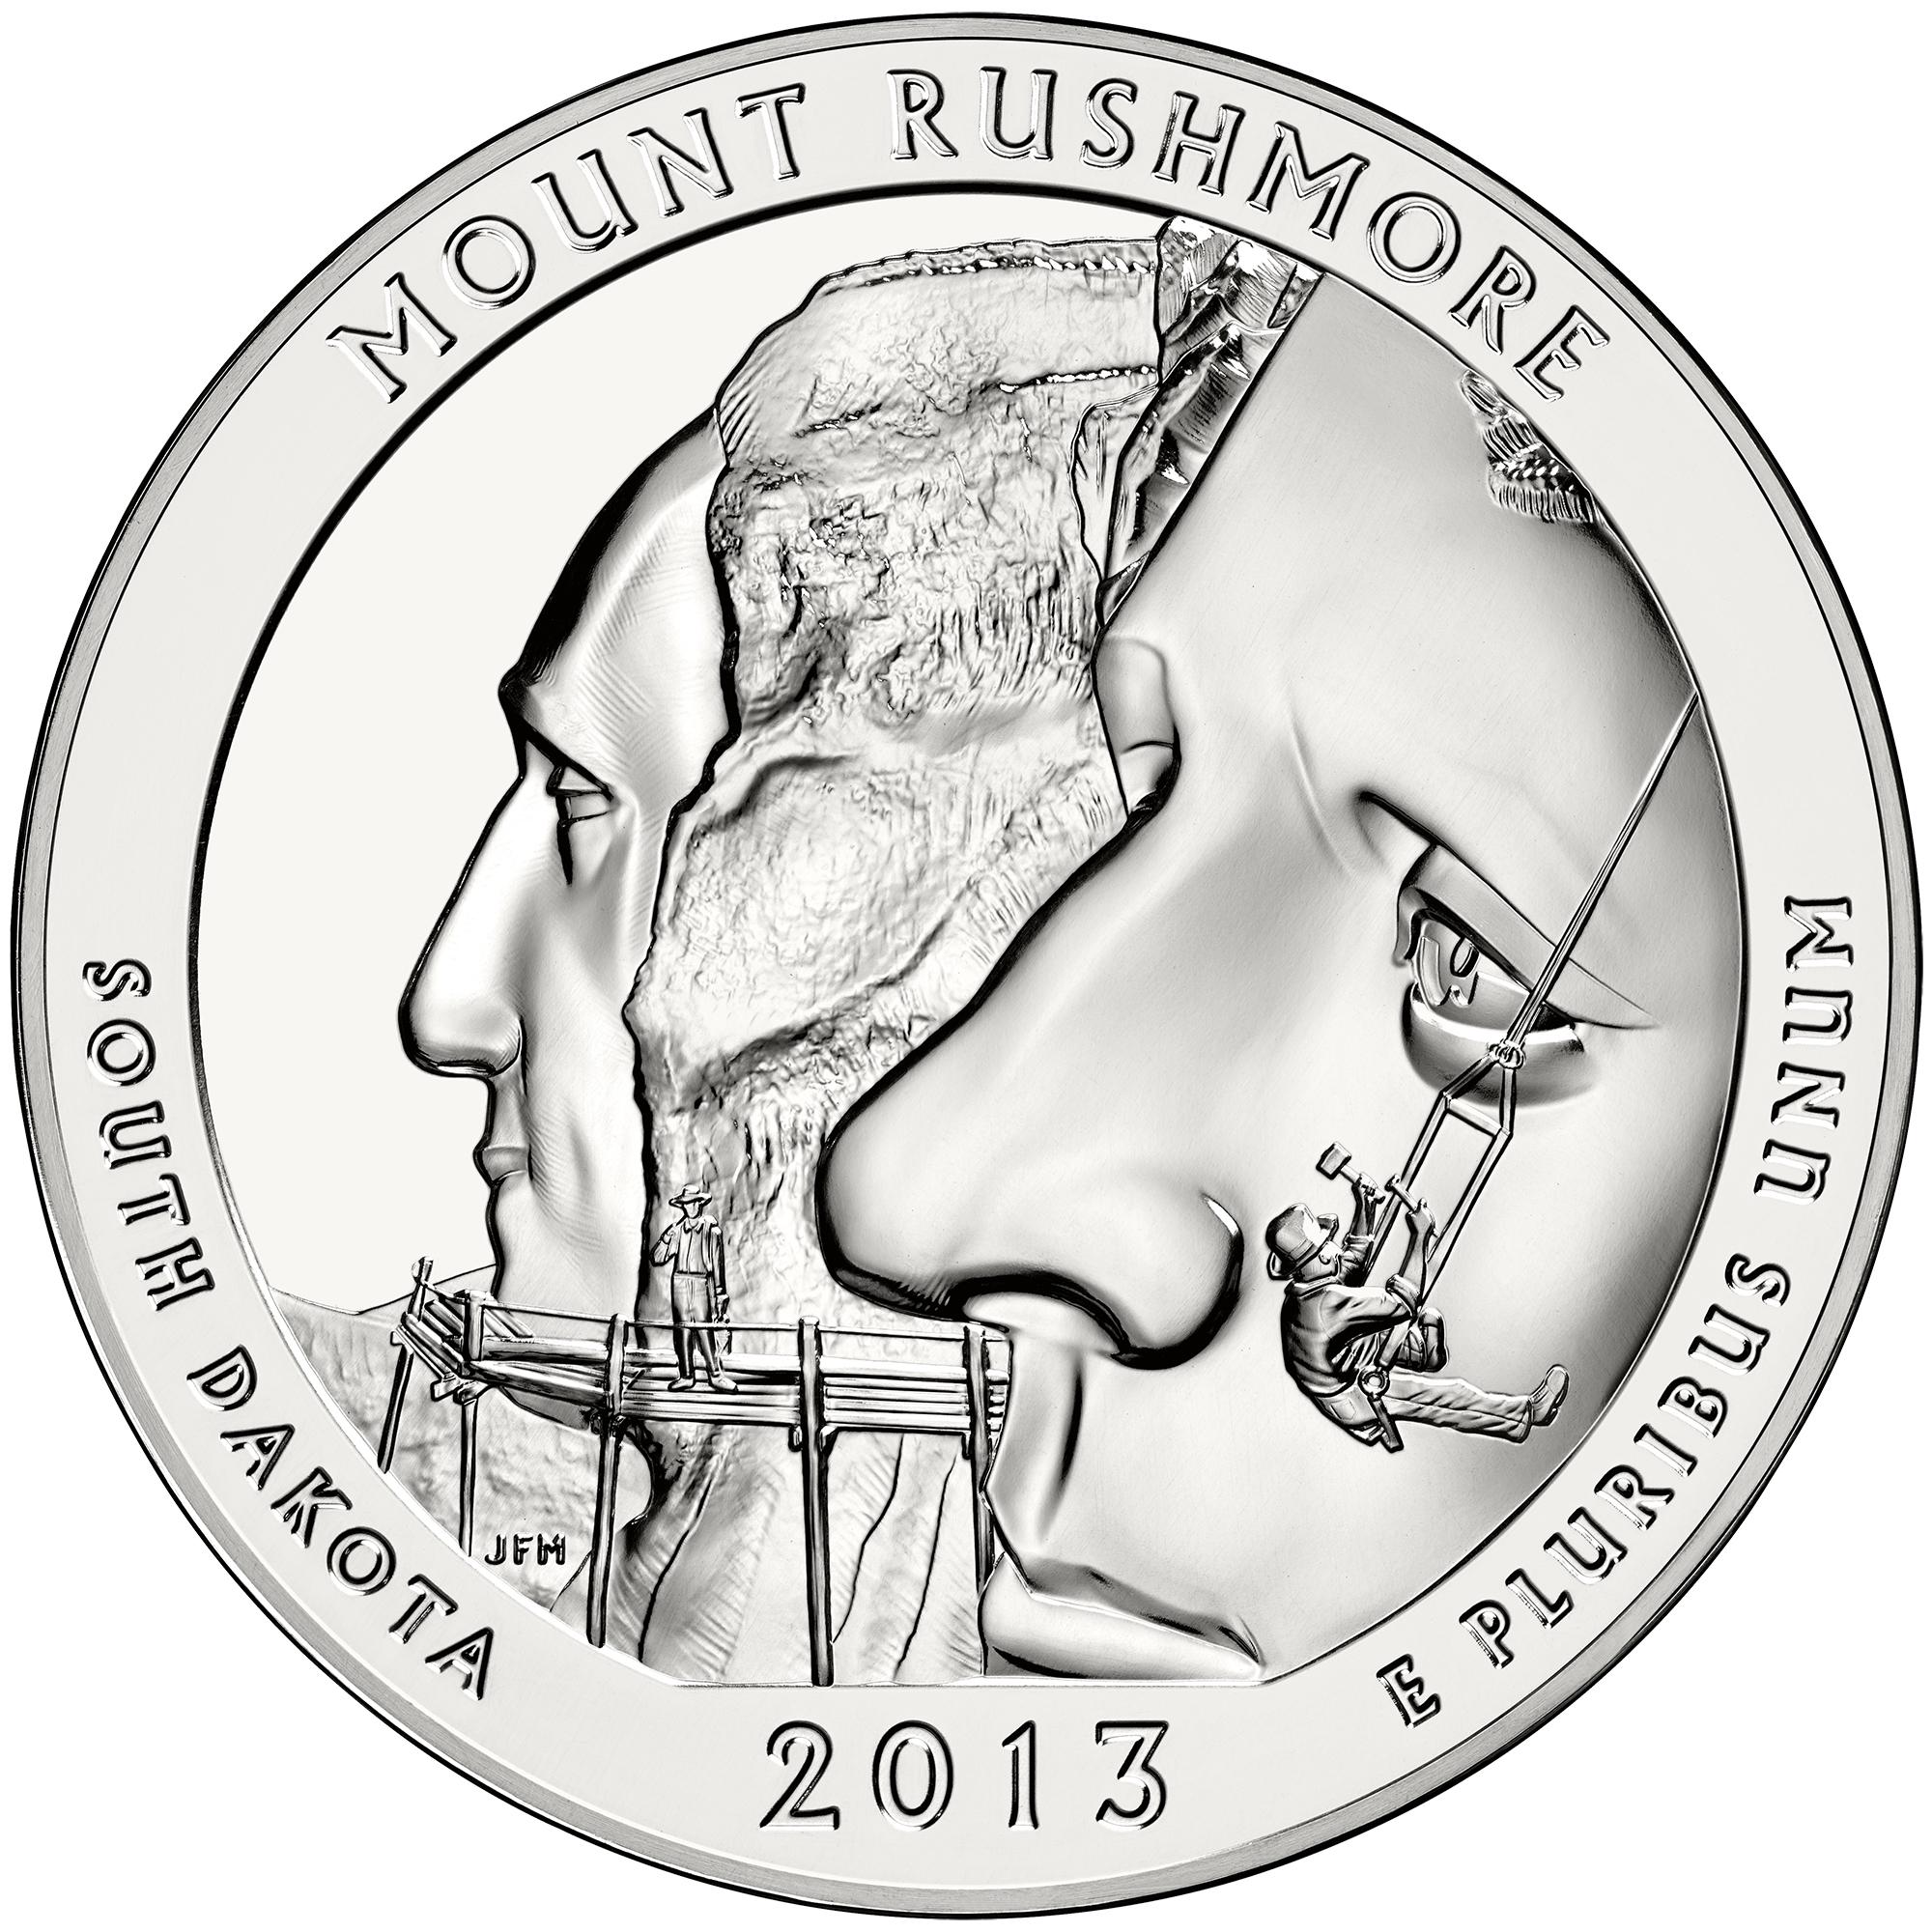 2013 America The Beautiful Quarters Five Ounce Silver Bullion Coin Mount Rushmore South Dakota Reverse